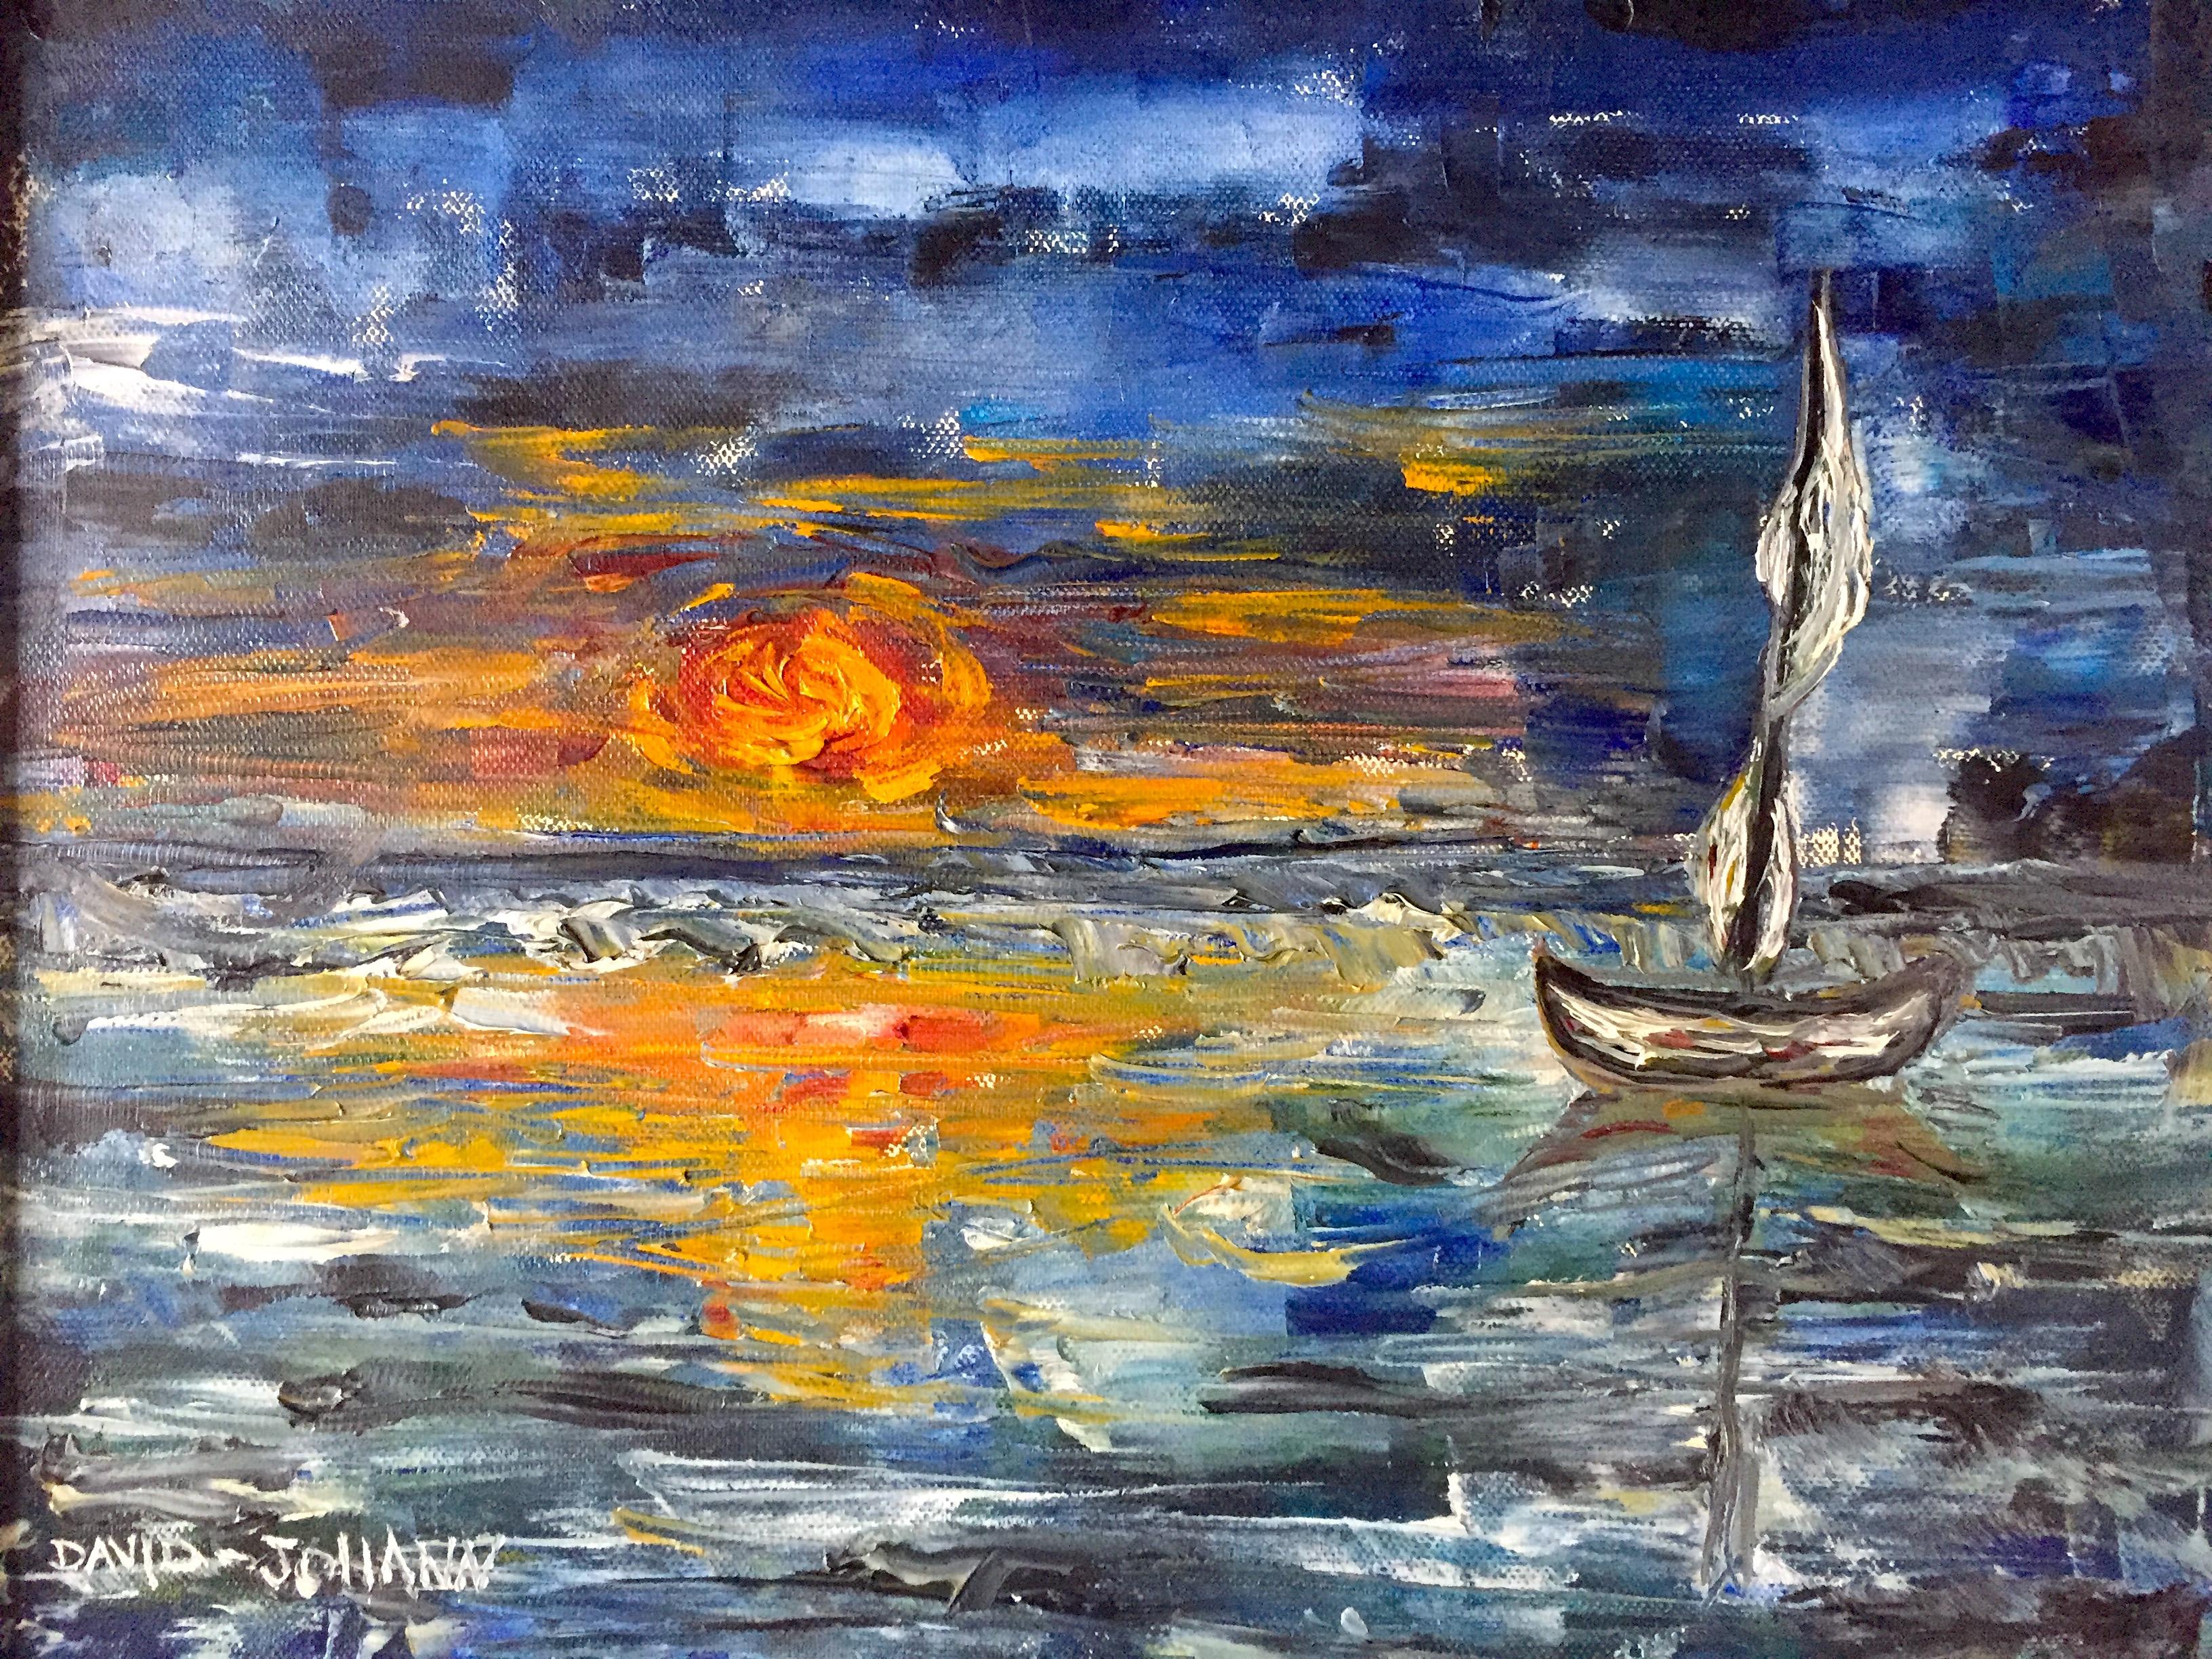 Mettre les voiles - David-Johann Dray